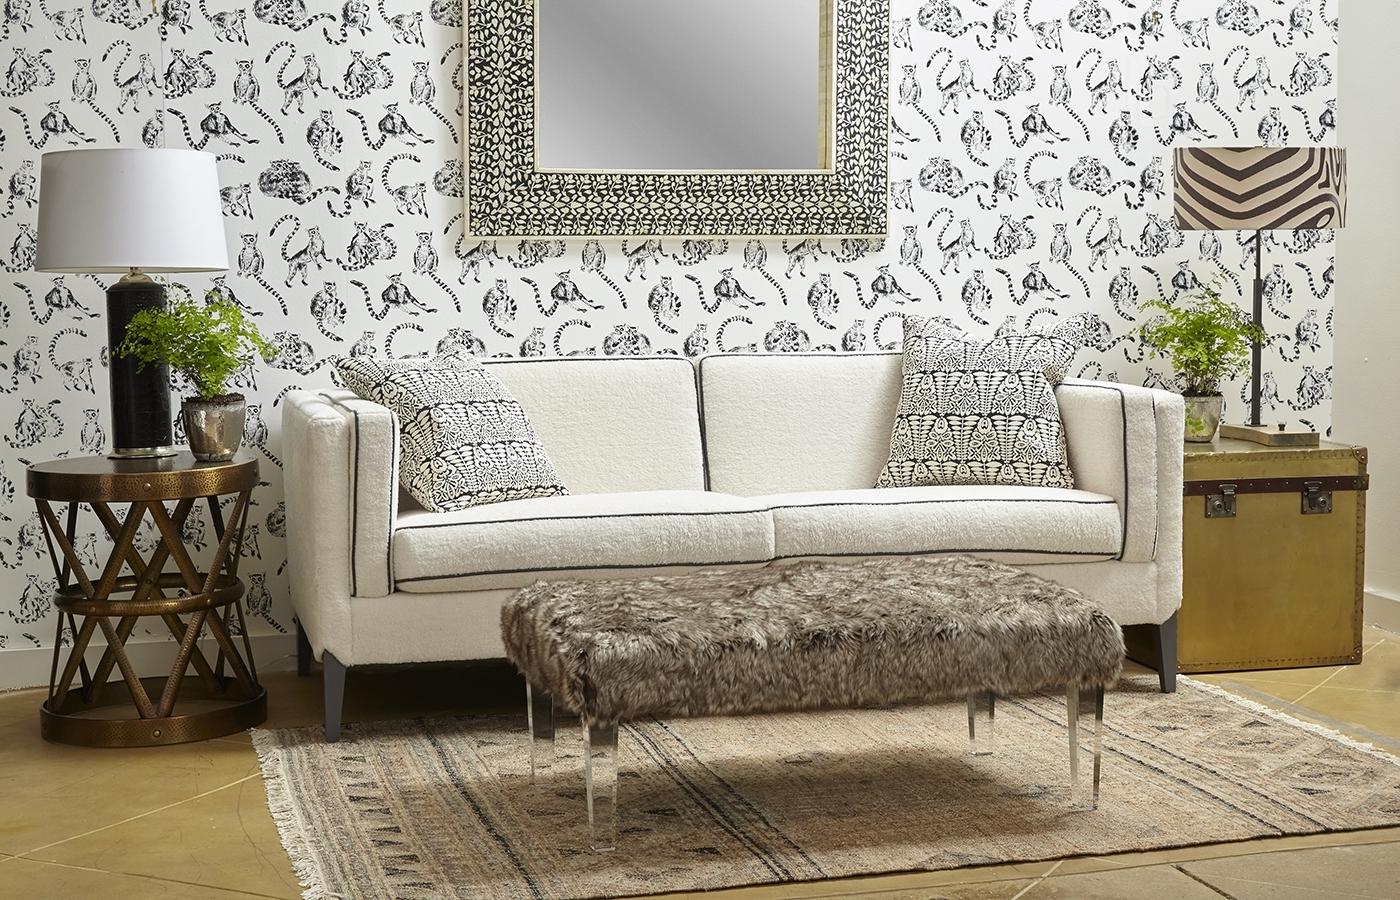 2019 Norwalk Furniture For Norwalk Sofas (View 2 of 20)